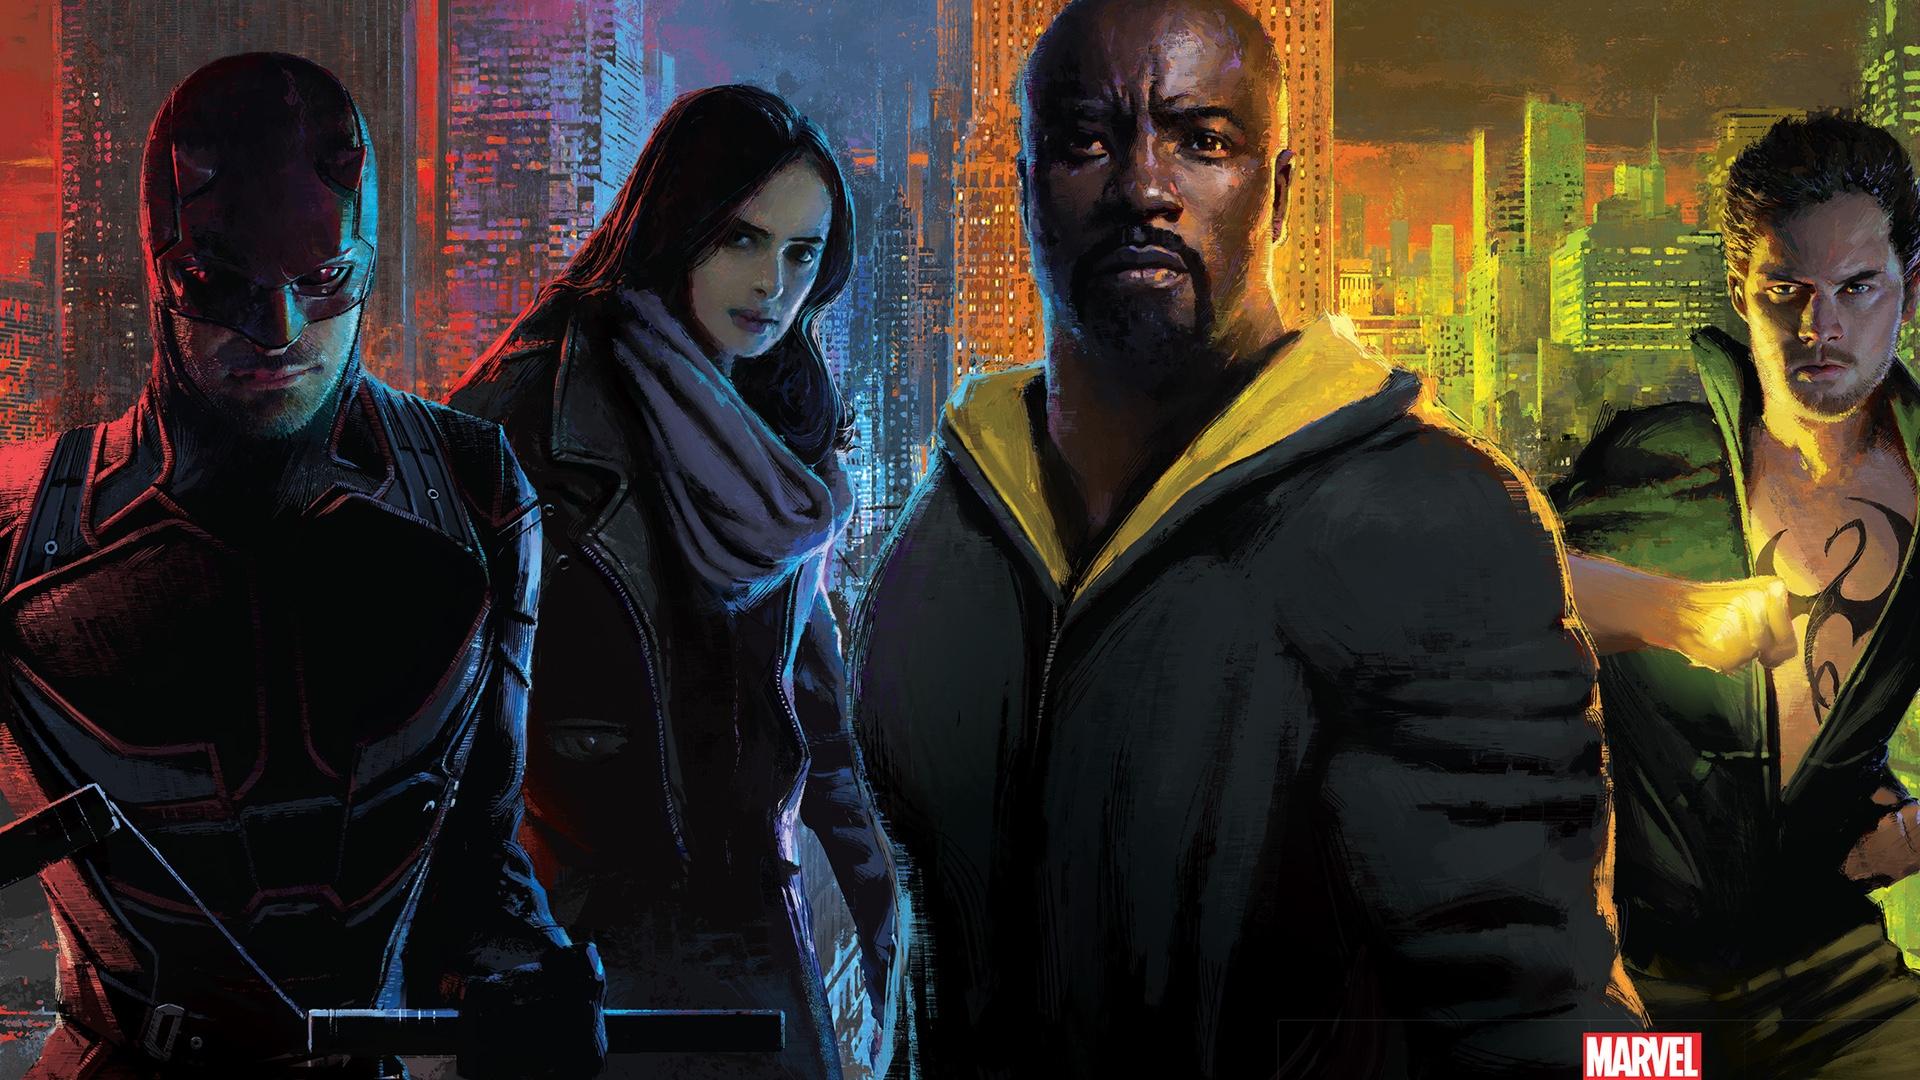 Badass New Trailer For Marvel's THE DEFENDERS — GeekTyrant